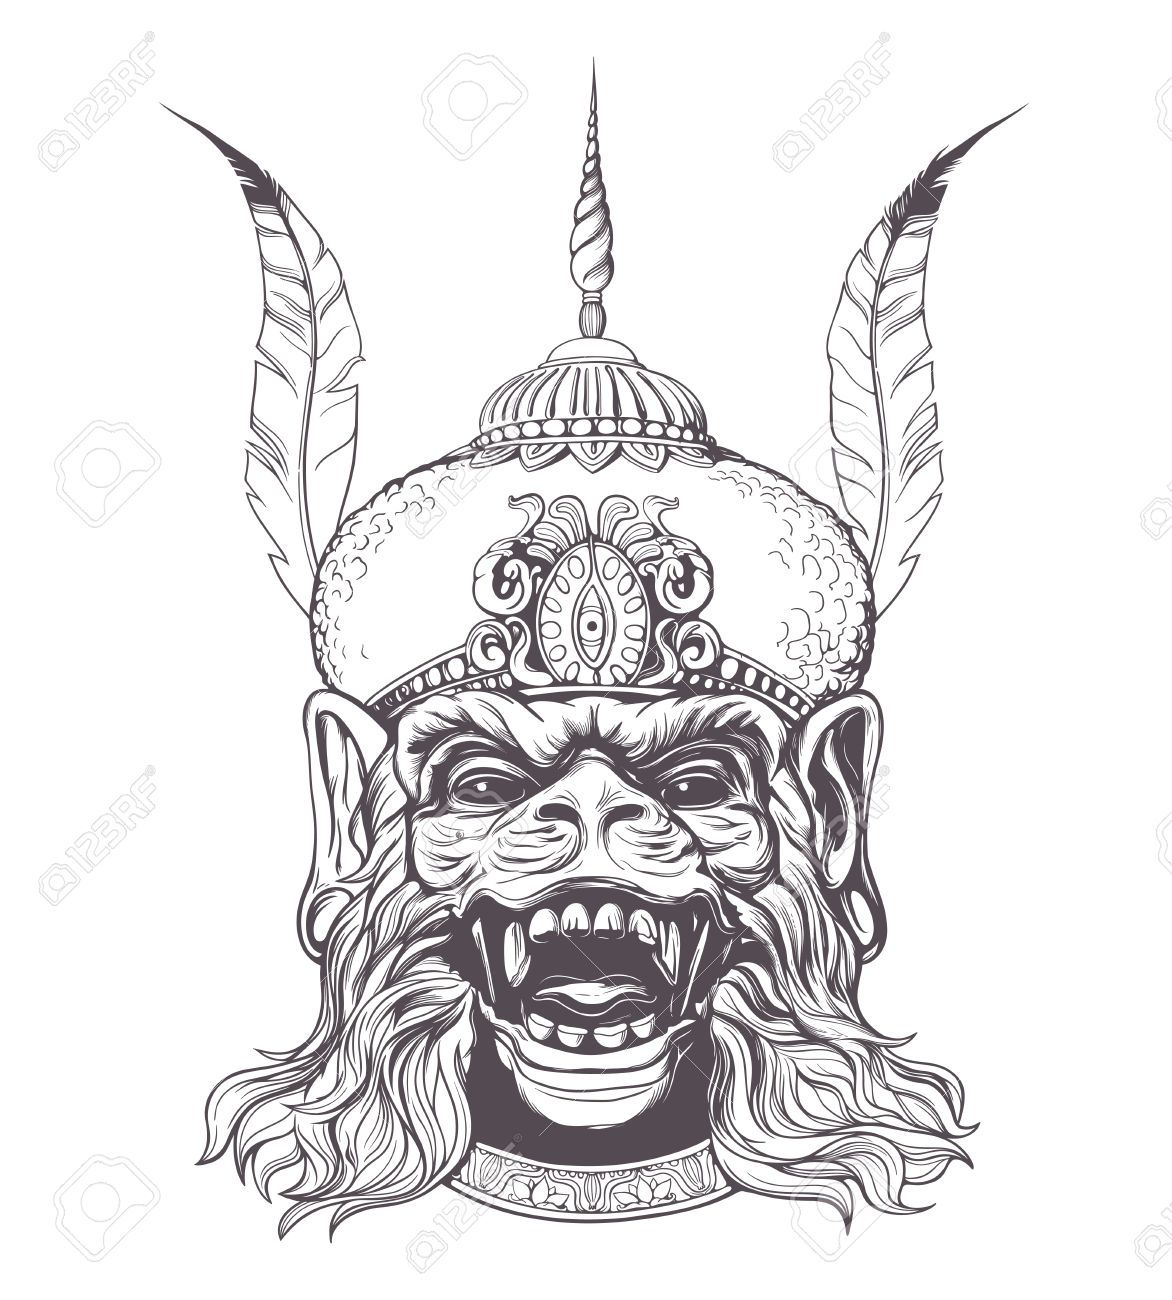 Hanuman thai drawing google search